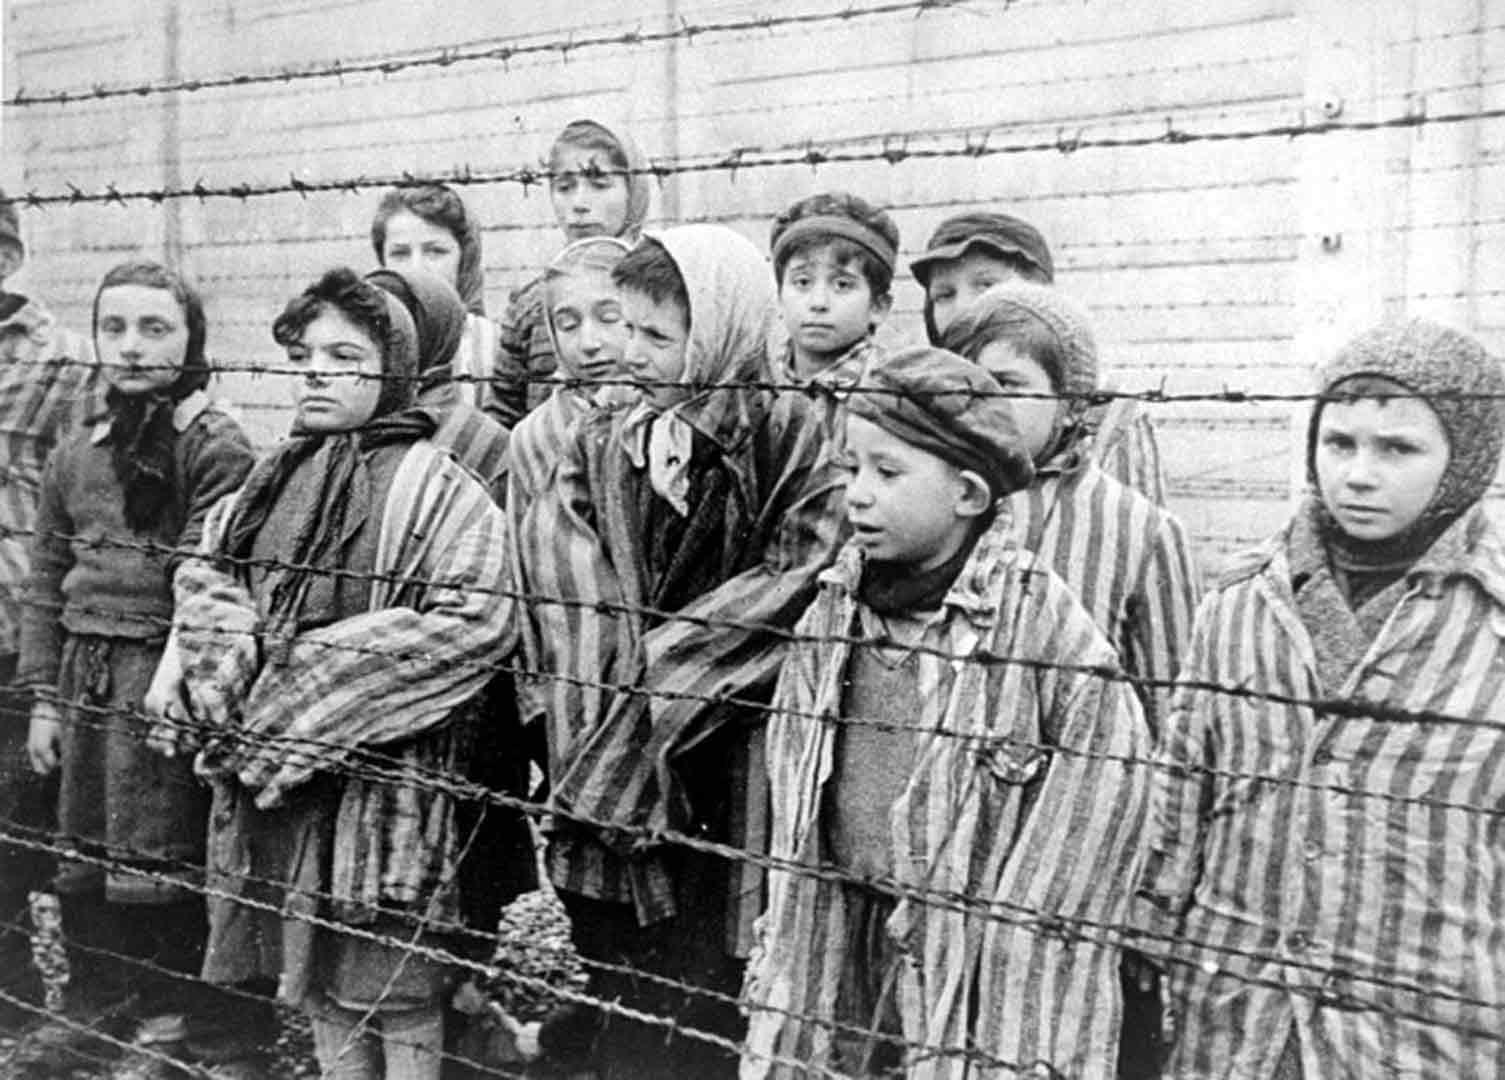 Auschwitz_photogramme_enfants-survivants2